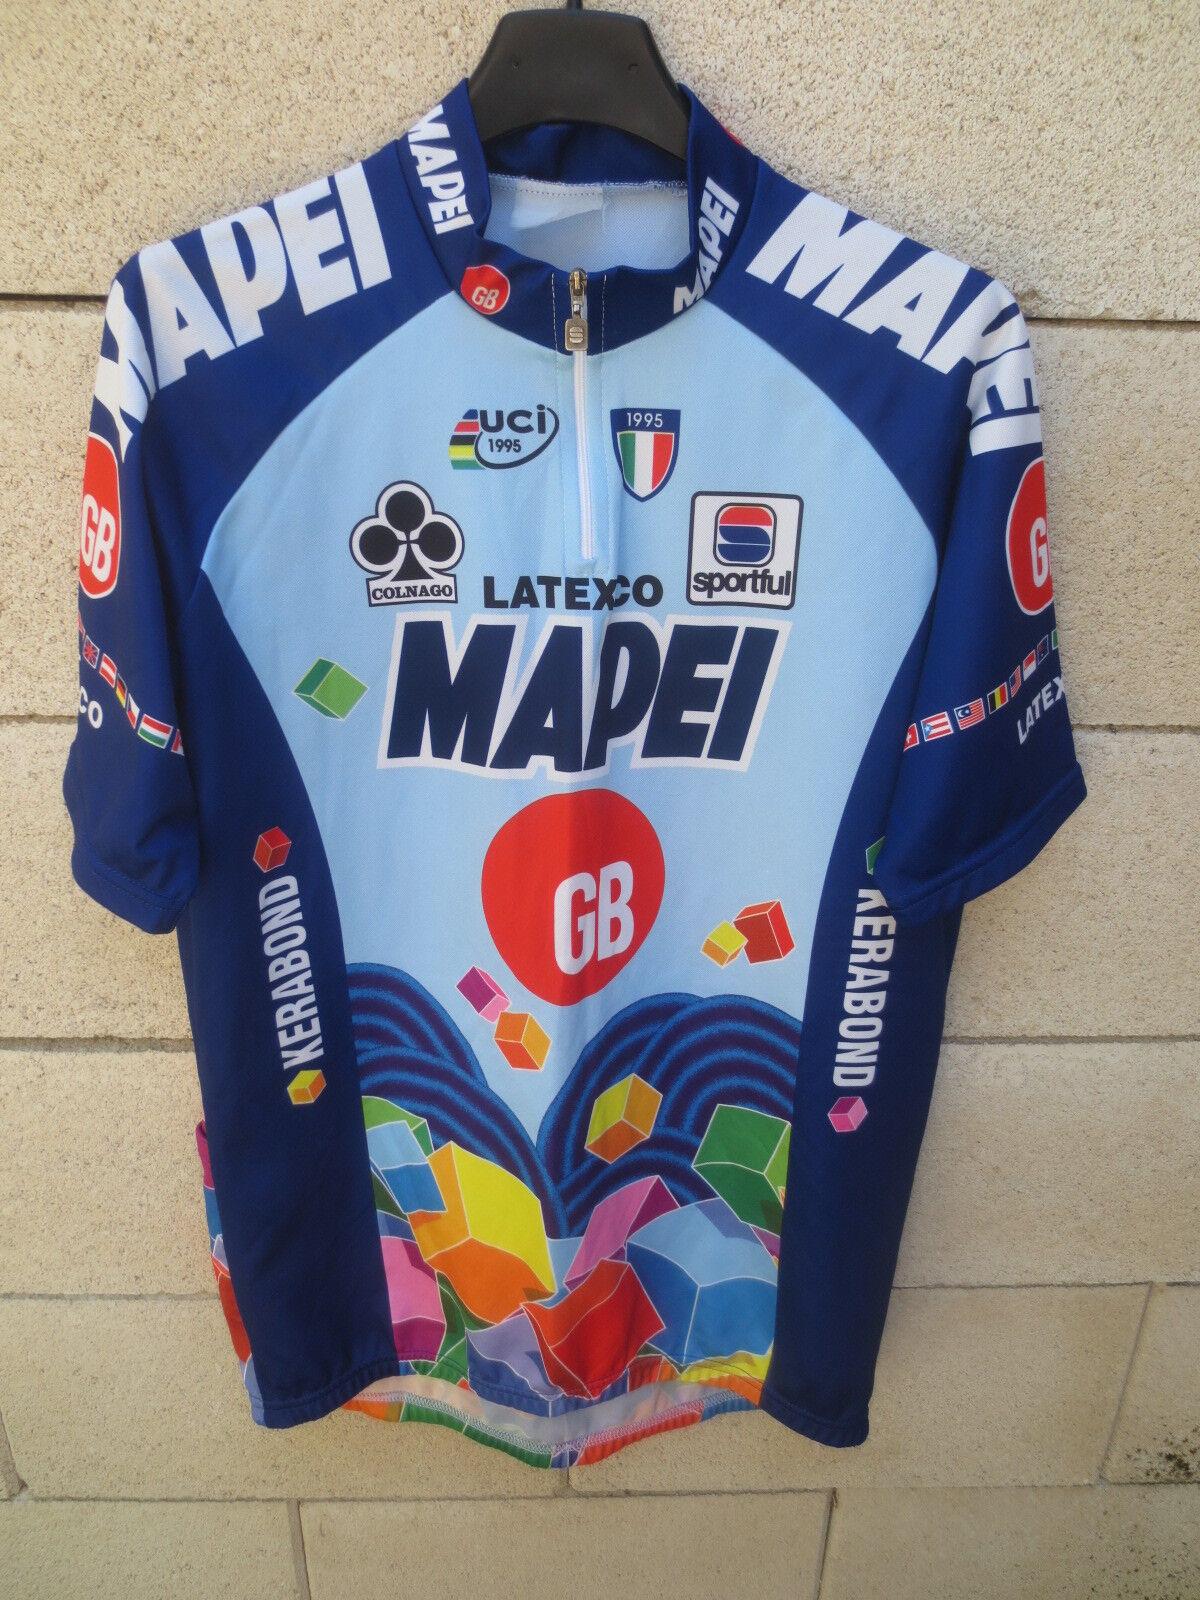 Maillot cycliste MAPEI GB vintage 1996 ROMINGER STEELS MUSEEUW shirt trikot XXL